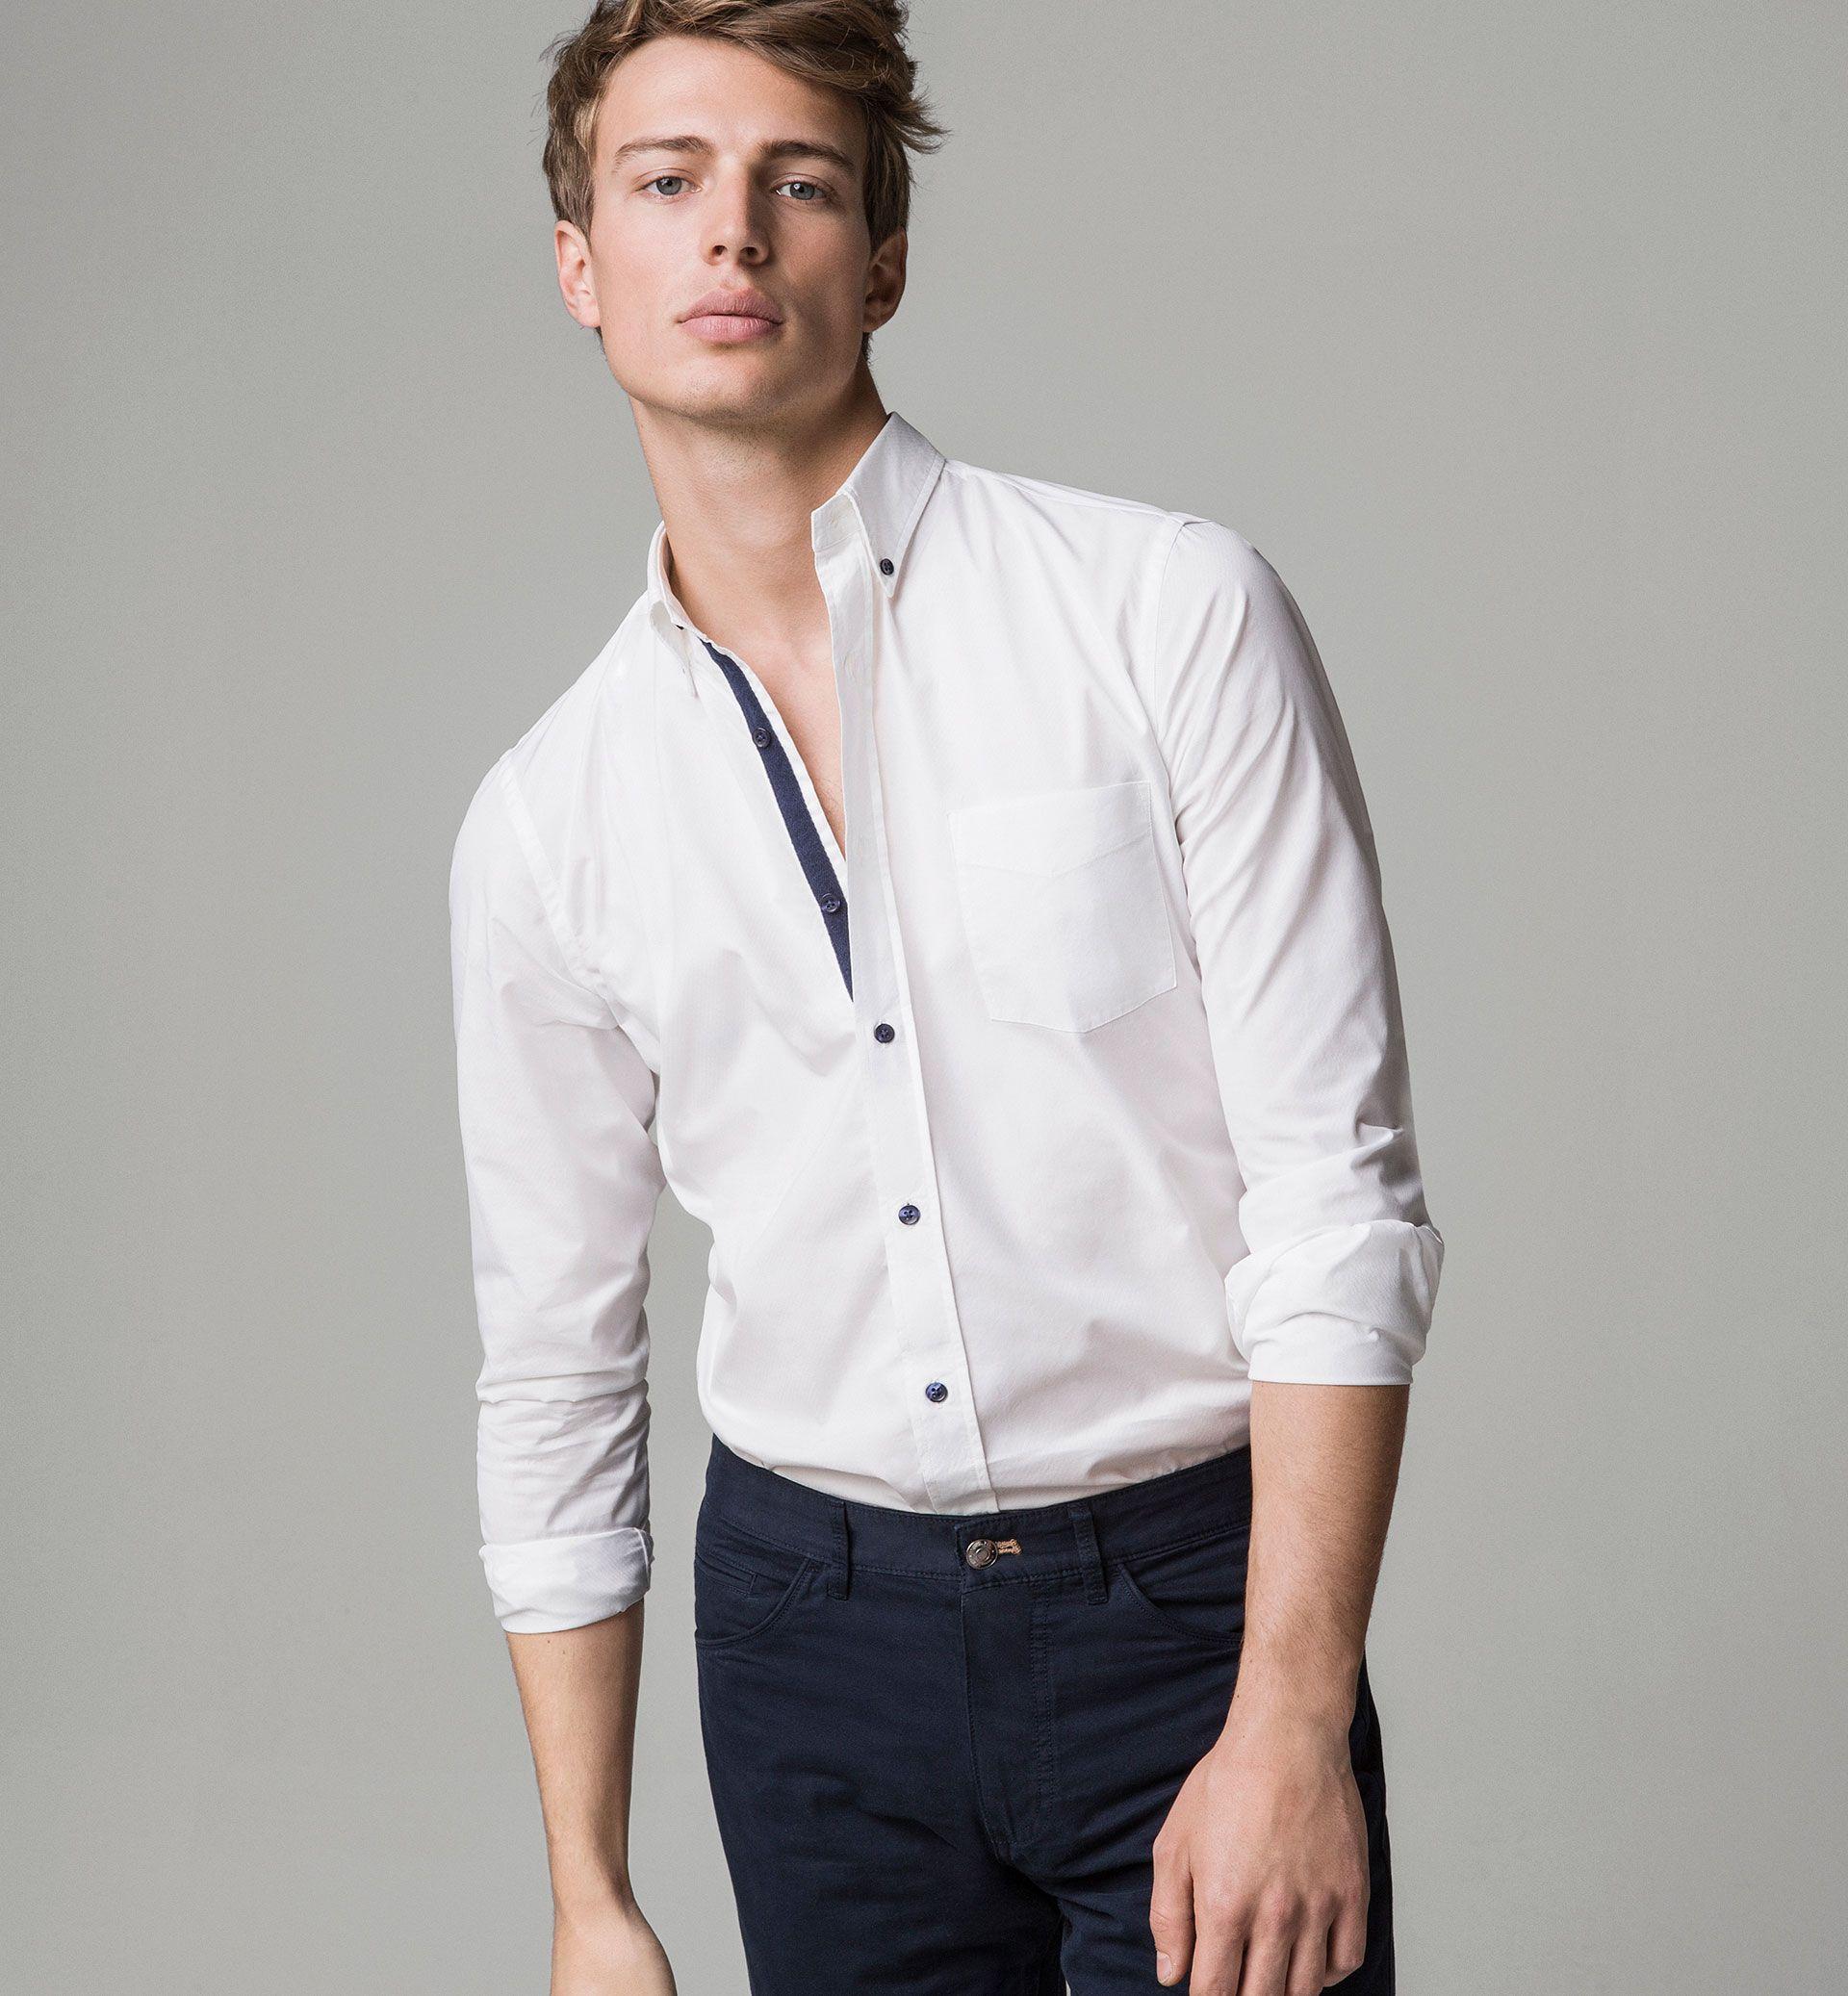 Slimfit textured weave shirt Надо купить pinterest